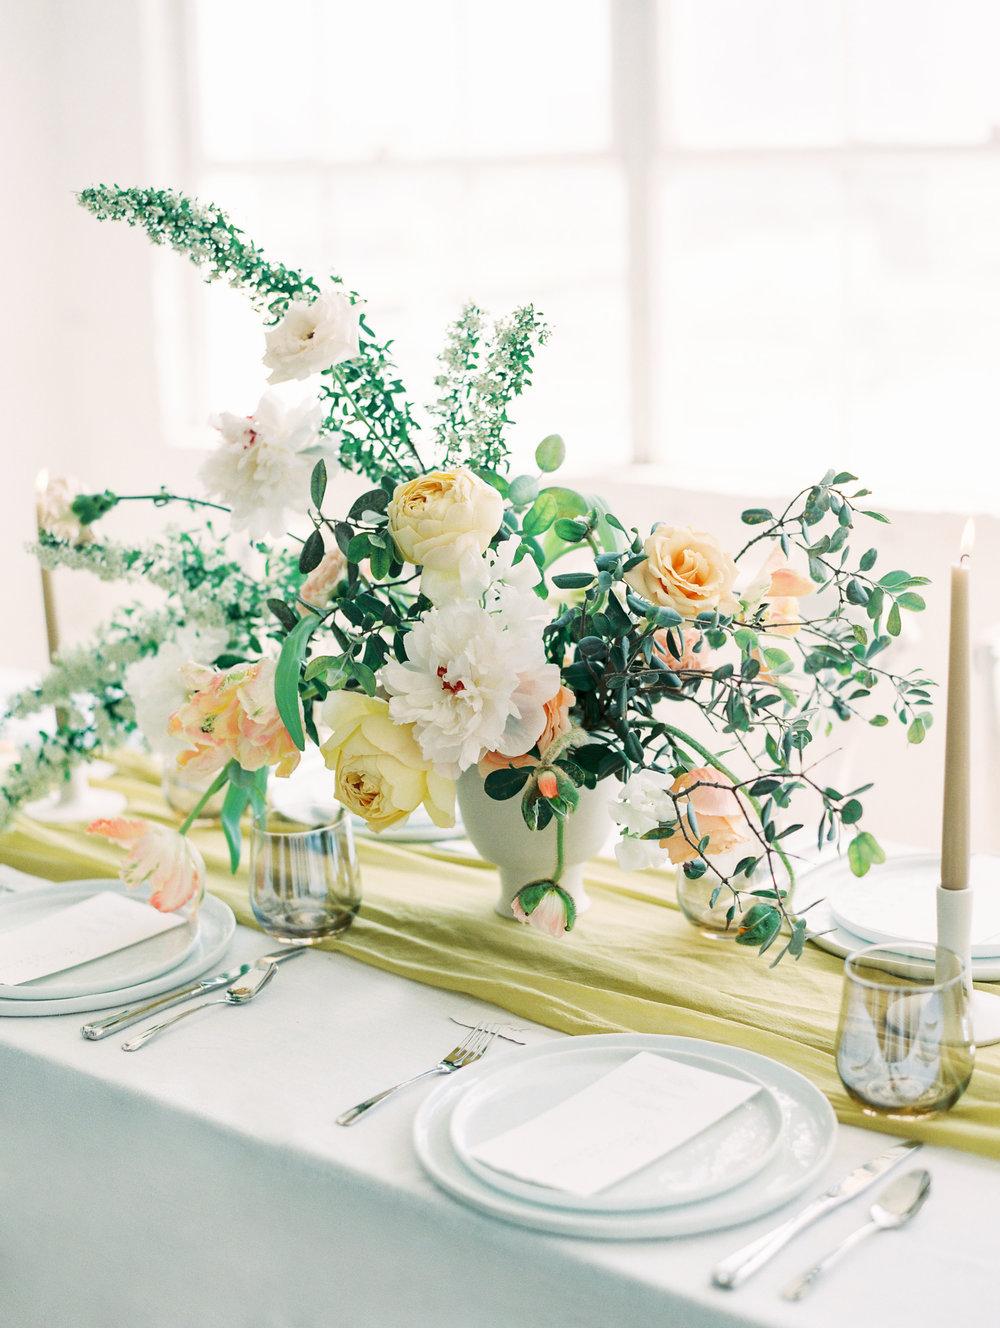 EUNICE + DAMIEN / wedding  photography by Ashley Ludaescher